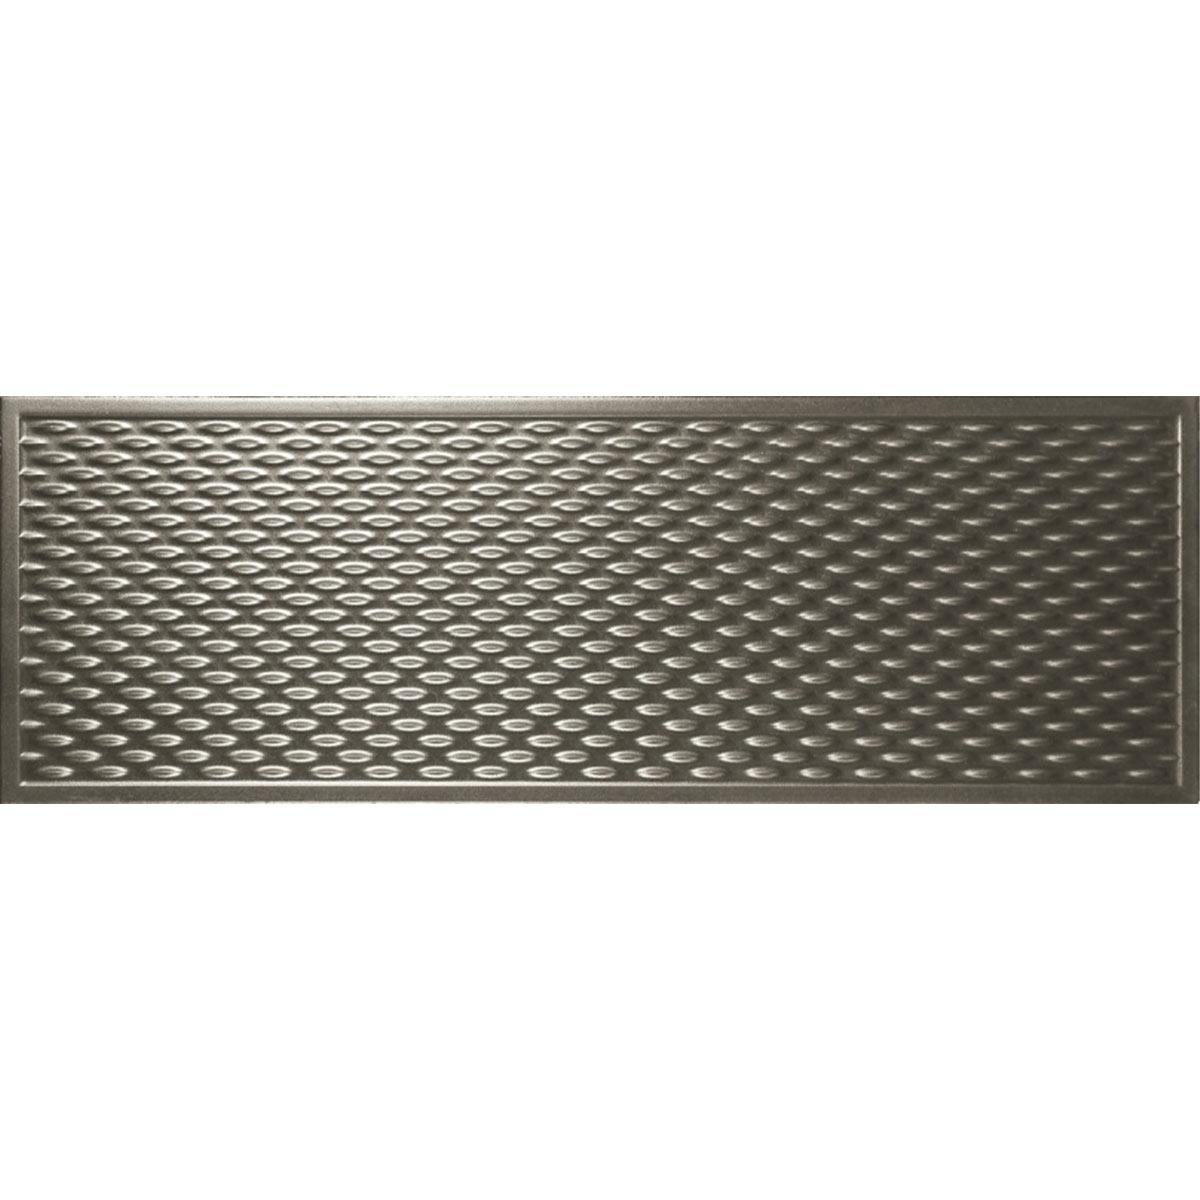 D00265 CAPE CLINKER METALIC